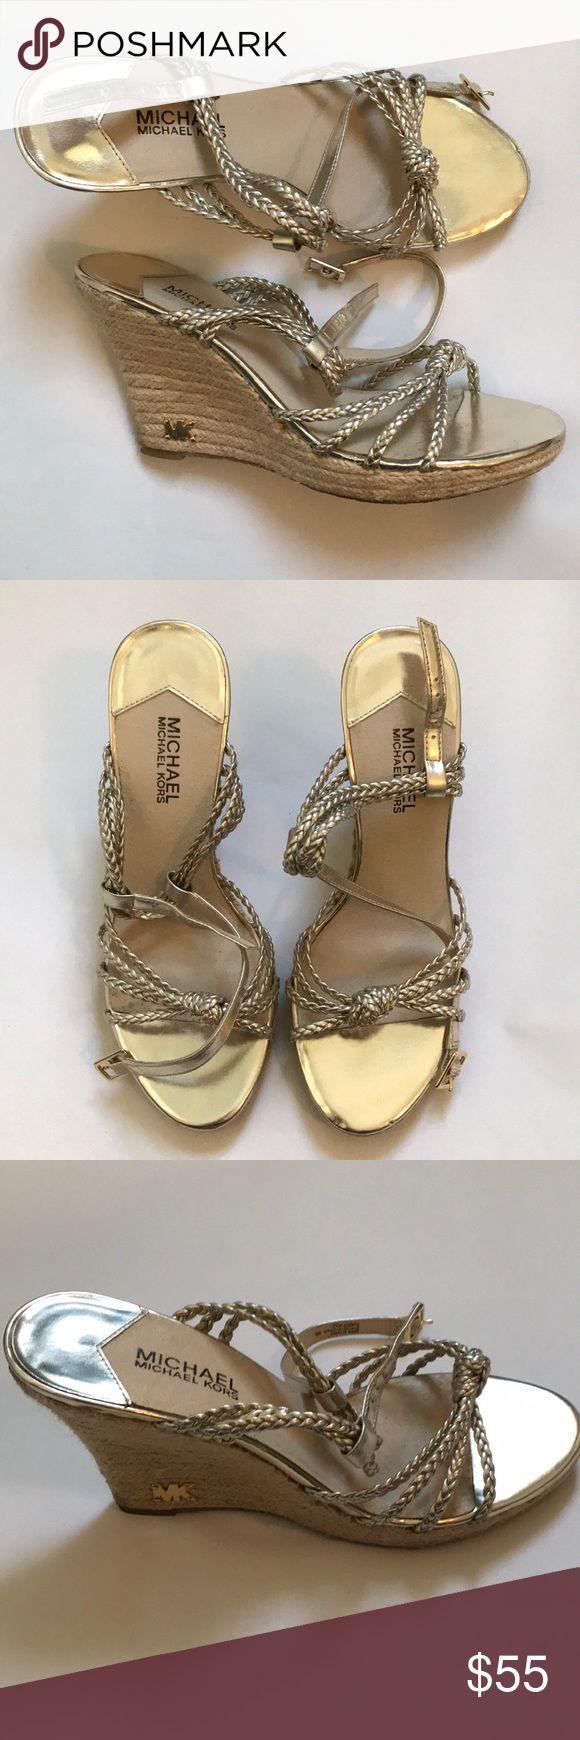 MICHAEL Michael Kors silver espadrilles MICHAEL Michael Kors silver espadrilles. Strappy and fun! MICHAEL Michael Kors Shoes Espadrilles